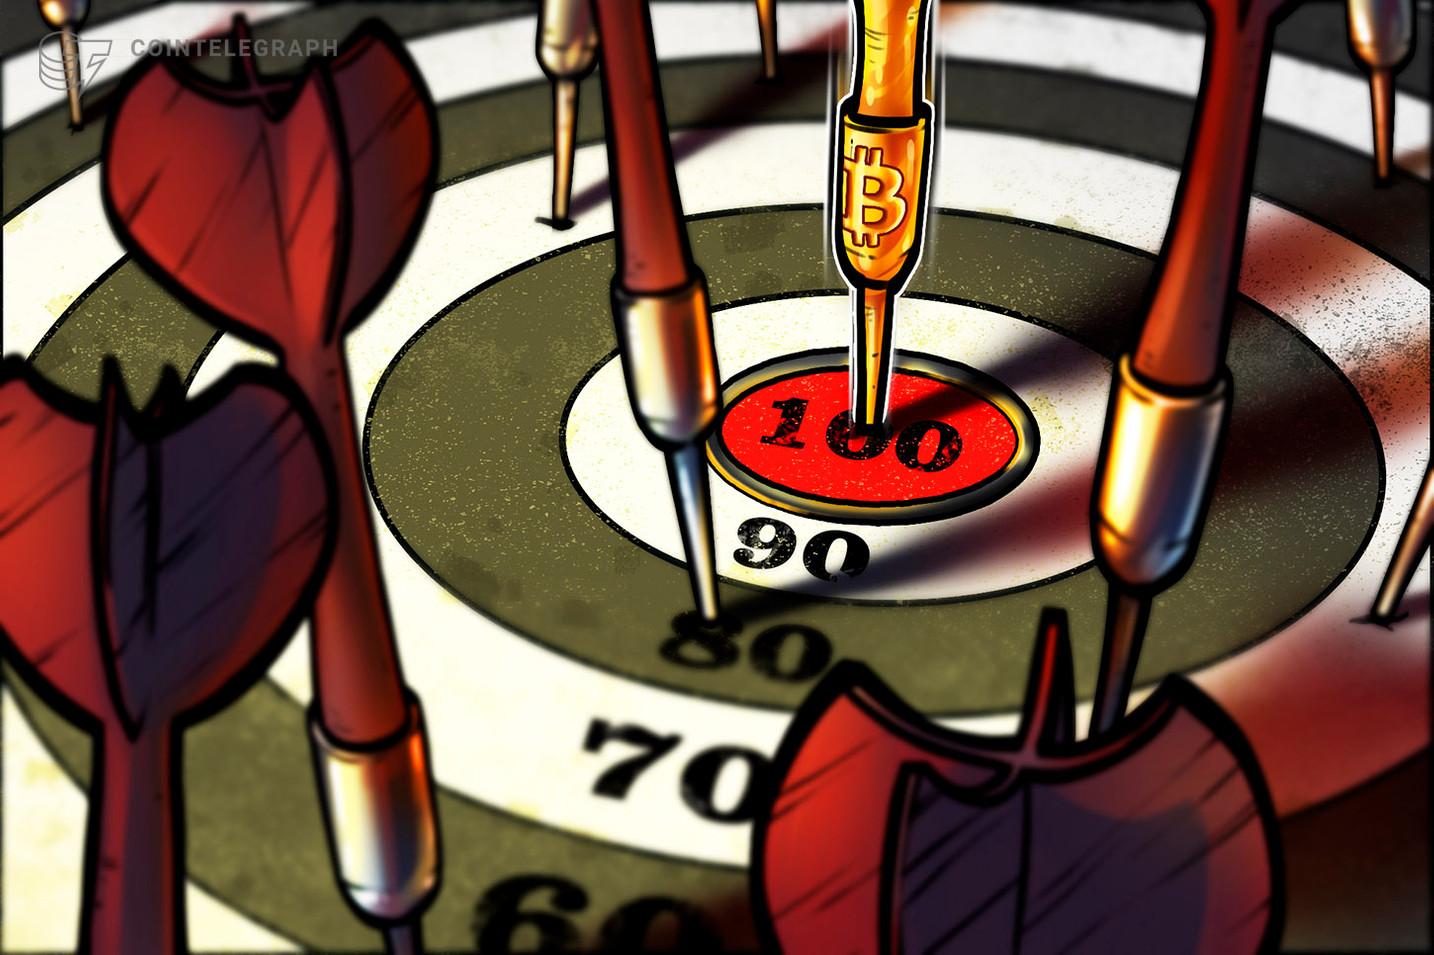 Standard Chartered: Bitcoin-Kurs bis Ende 2021 oder Anfang 2022 auf 100.000 US-Dollar